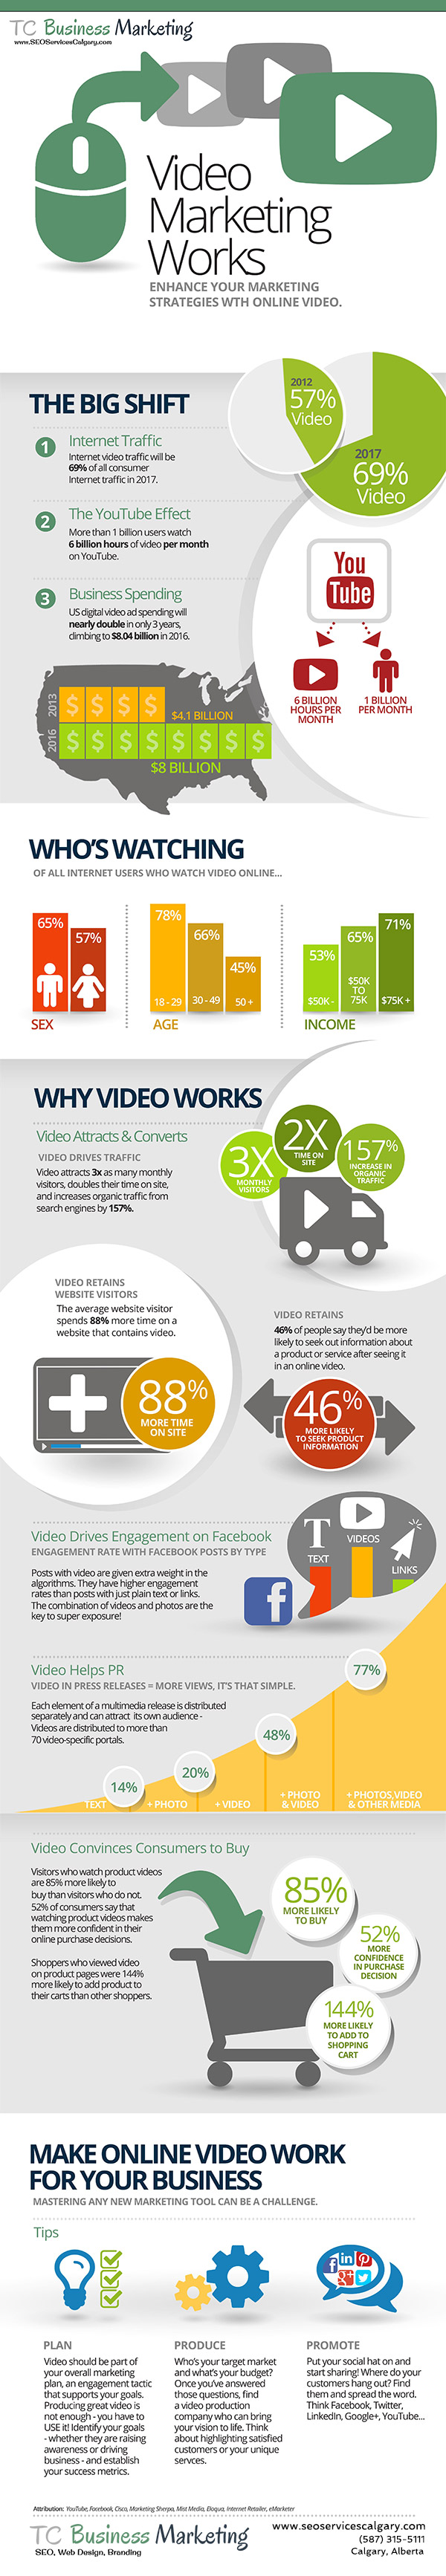 Video-Marketing-Infographic-TC-Business-Marketing